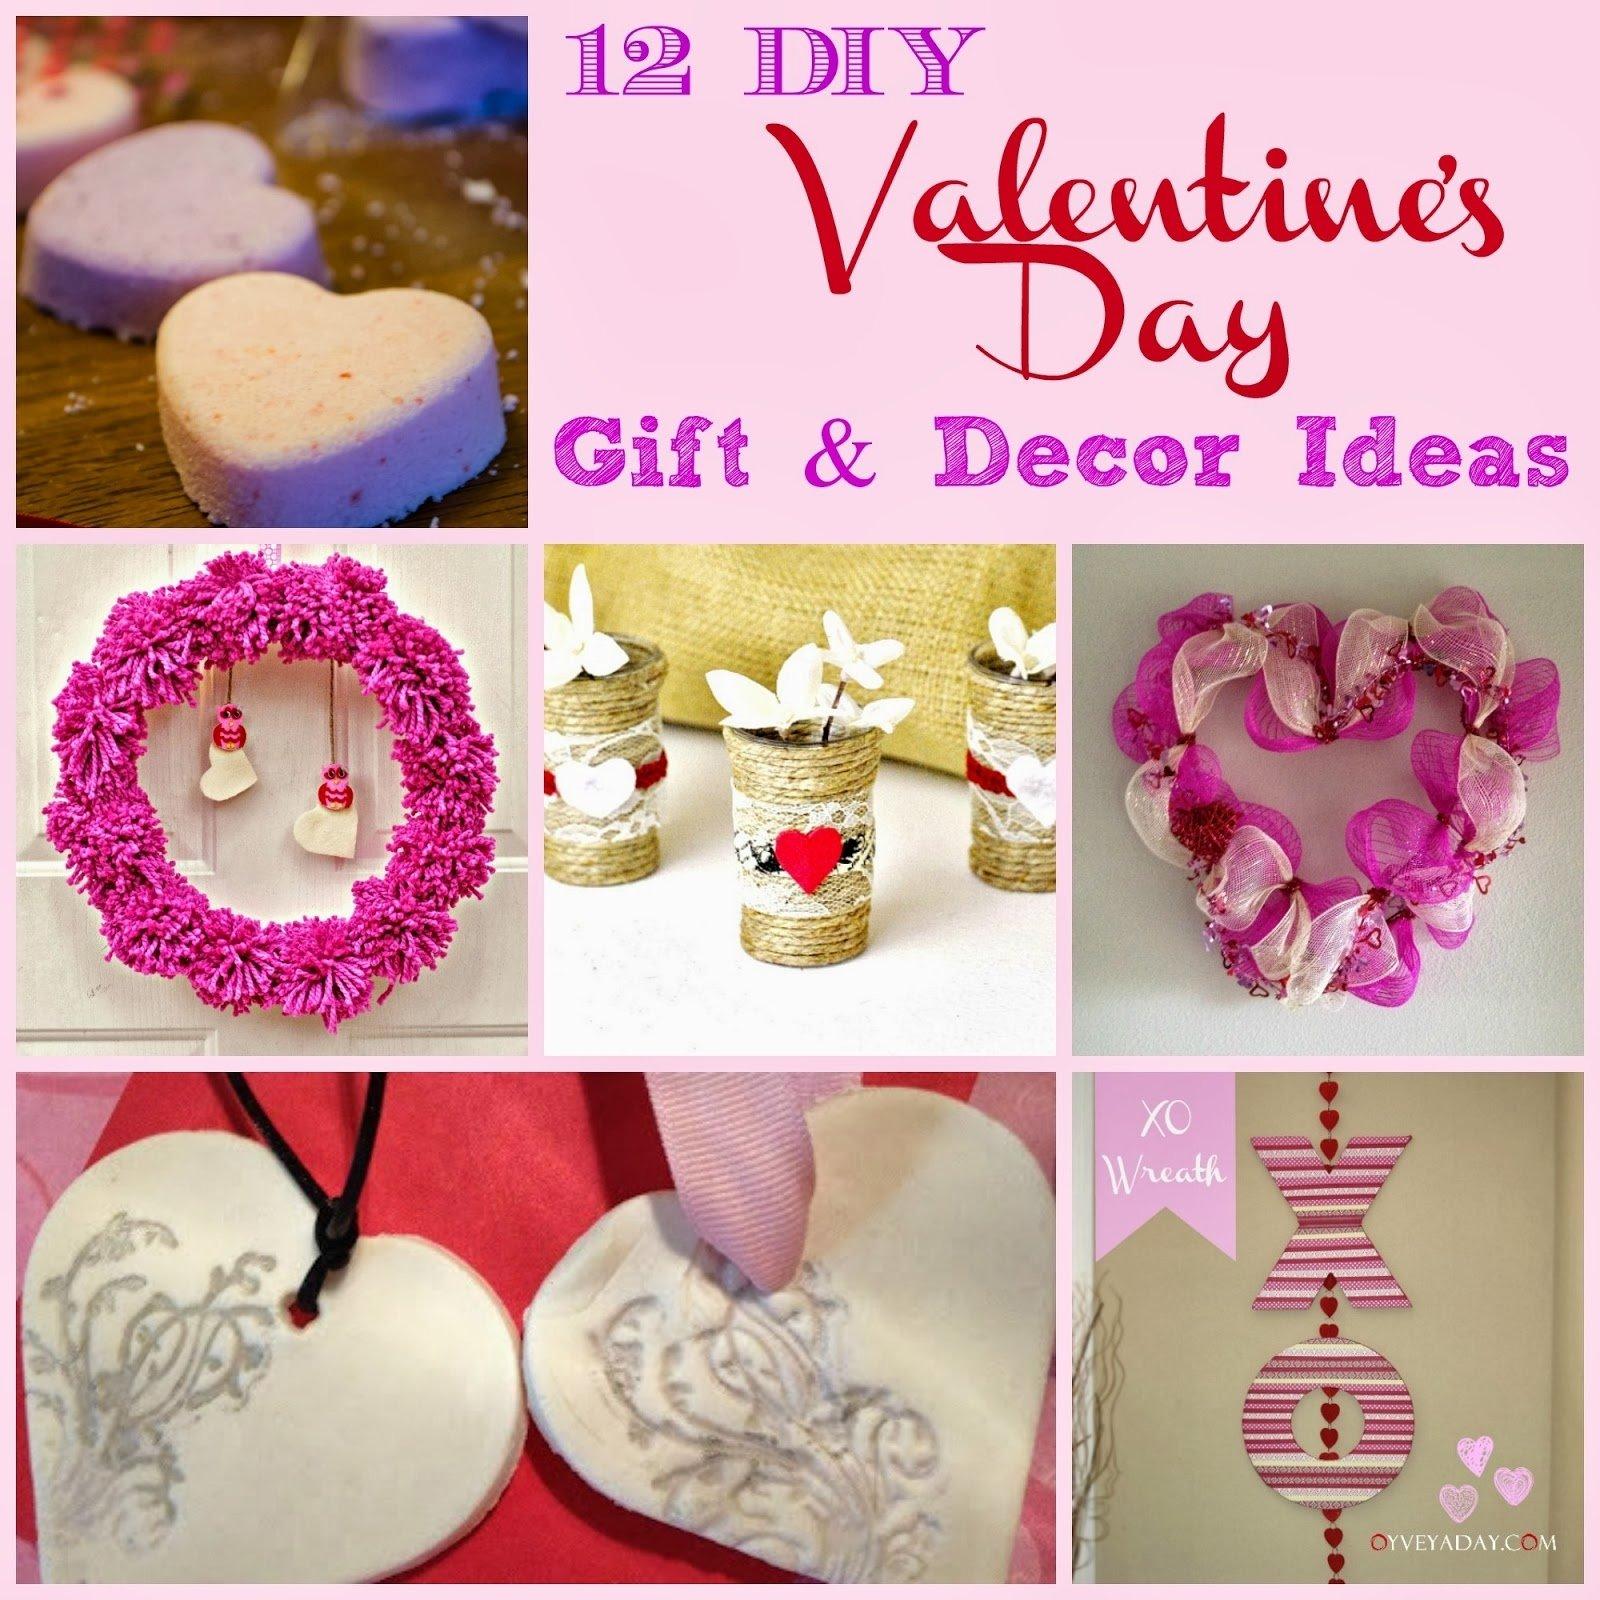 10 Attractive Craft Ideas For Valentines Day 12 diy valentines day gift decor ideas diys 2021